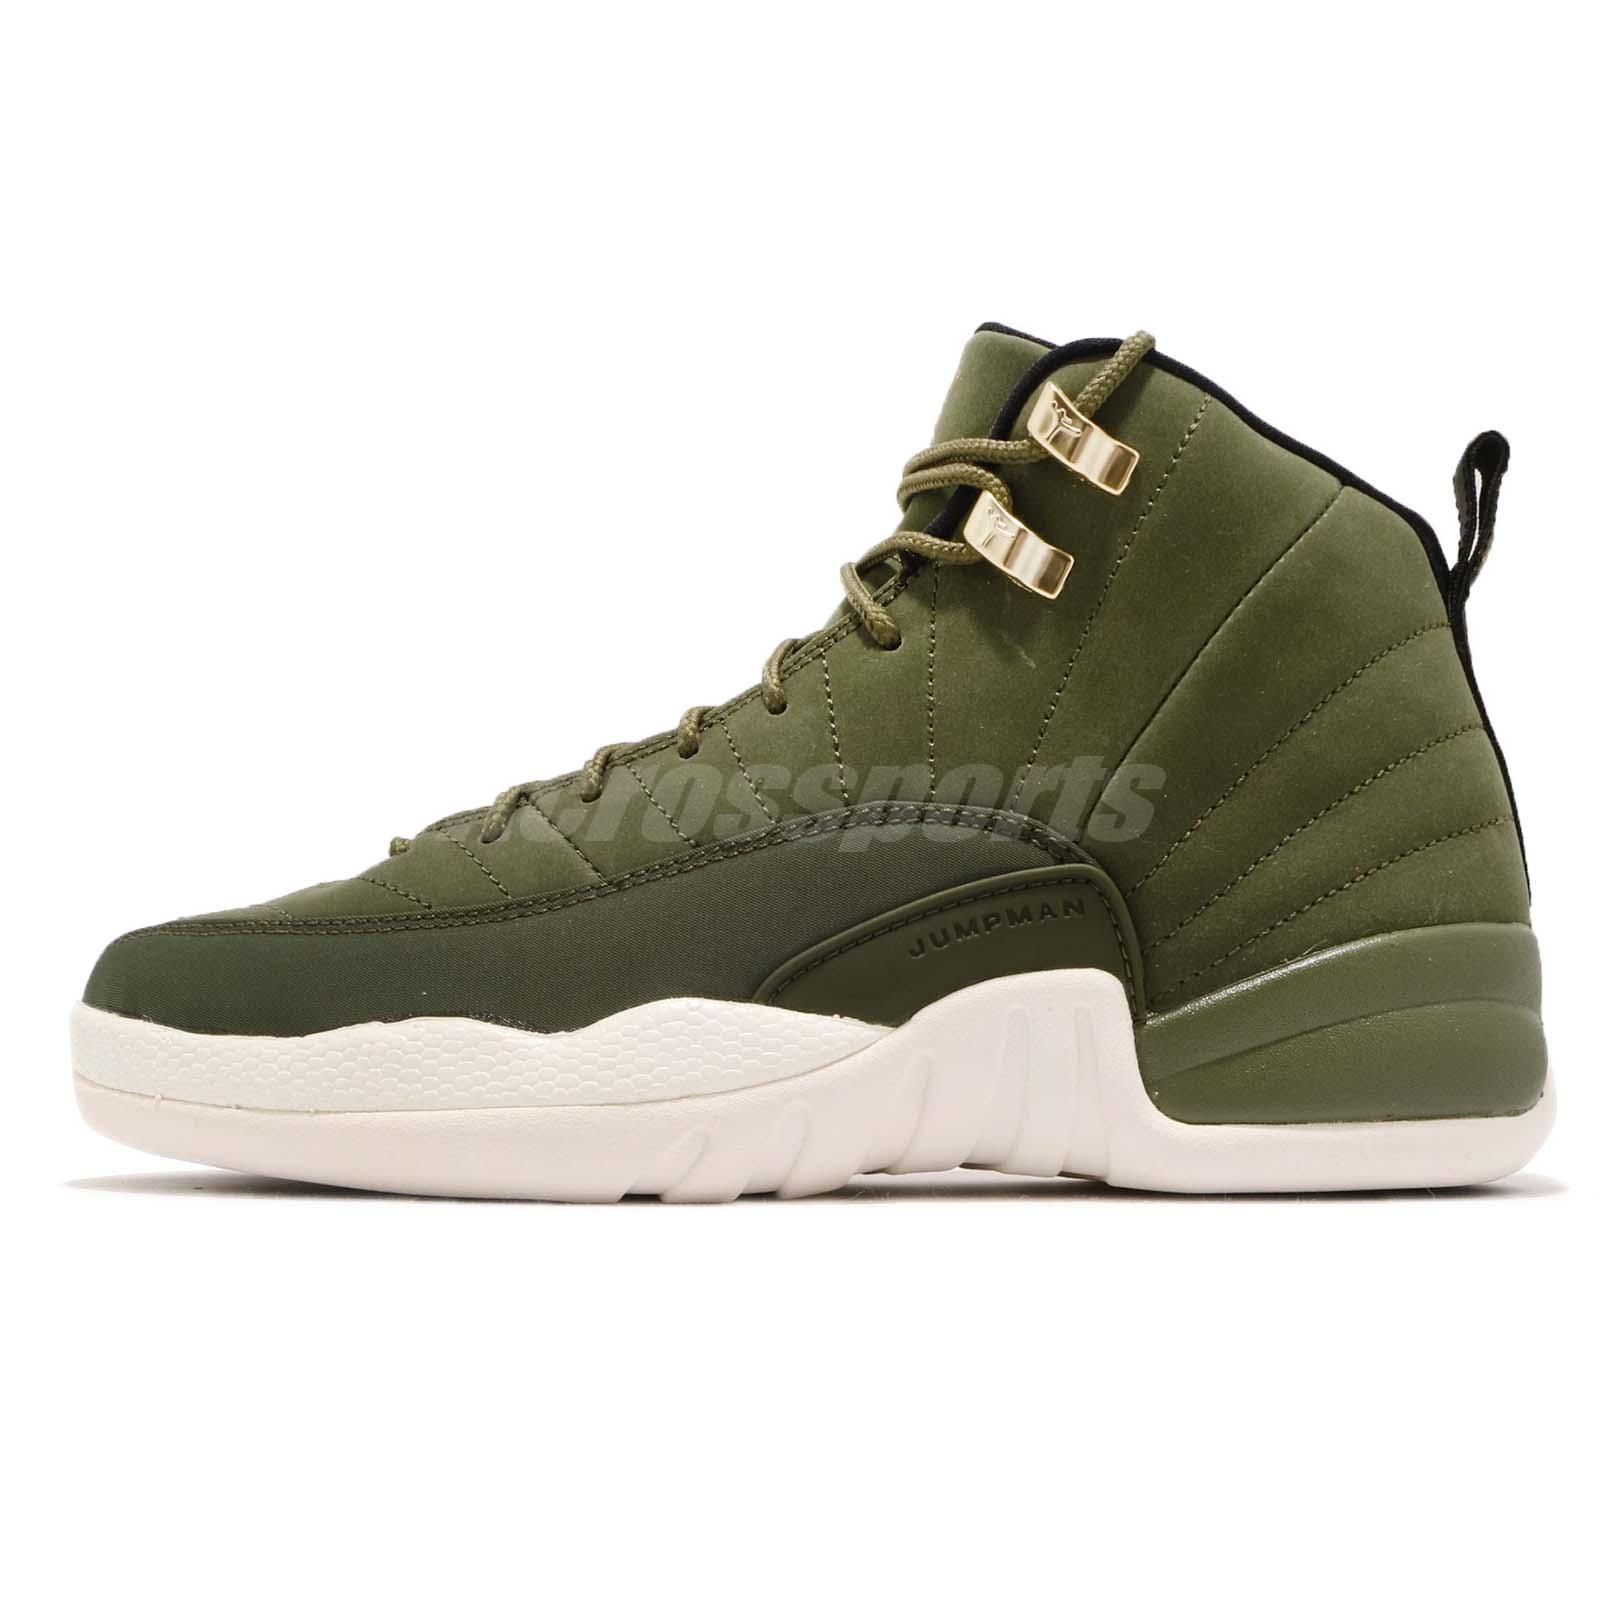 fdd67bc2279 Nike Air Jordan 12 Retro GS Chris Paul Class Of 2003 Olive Kids Women 153265 -301